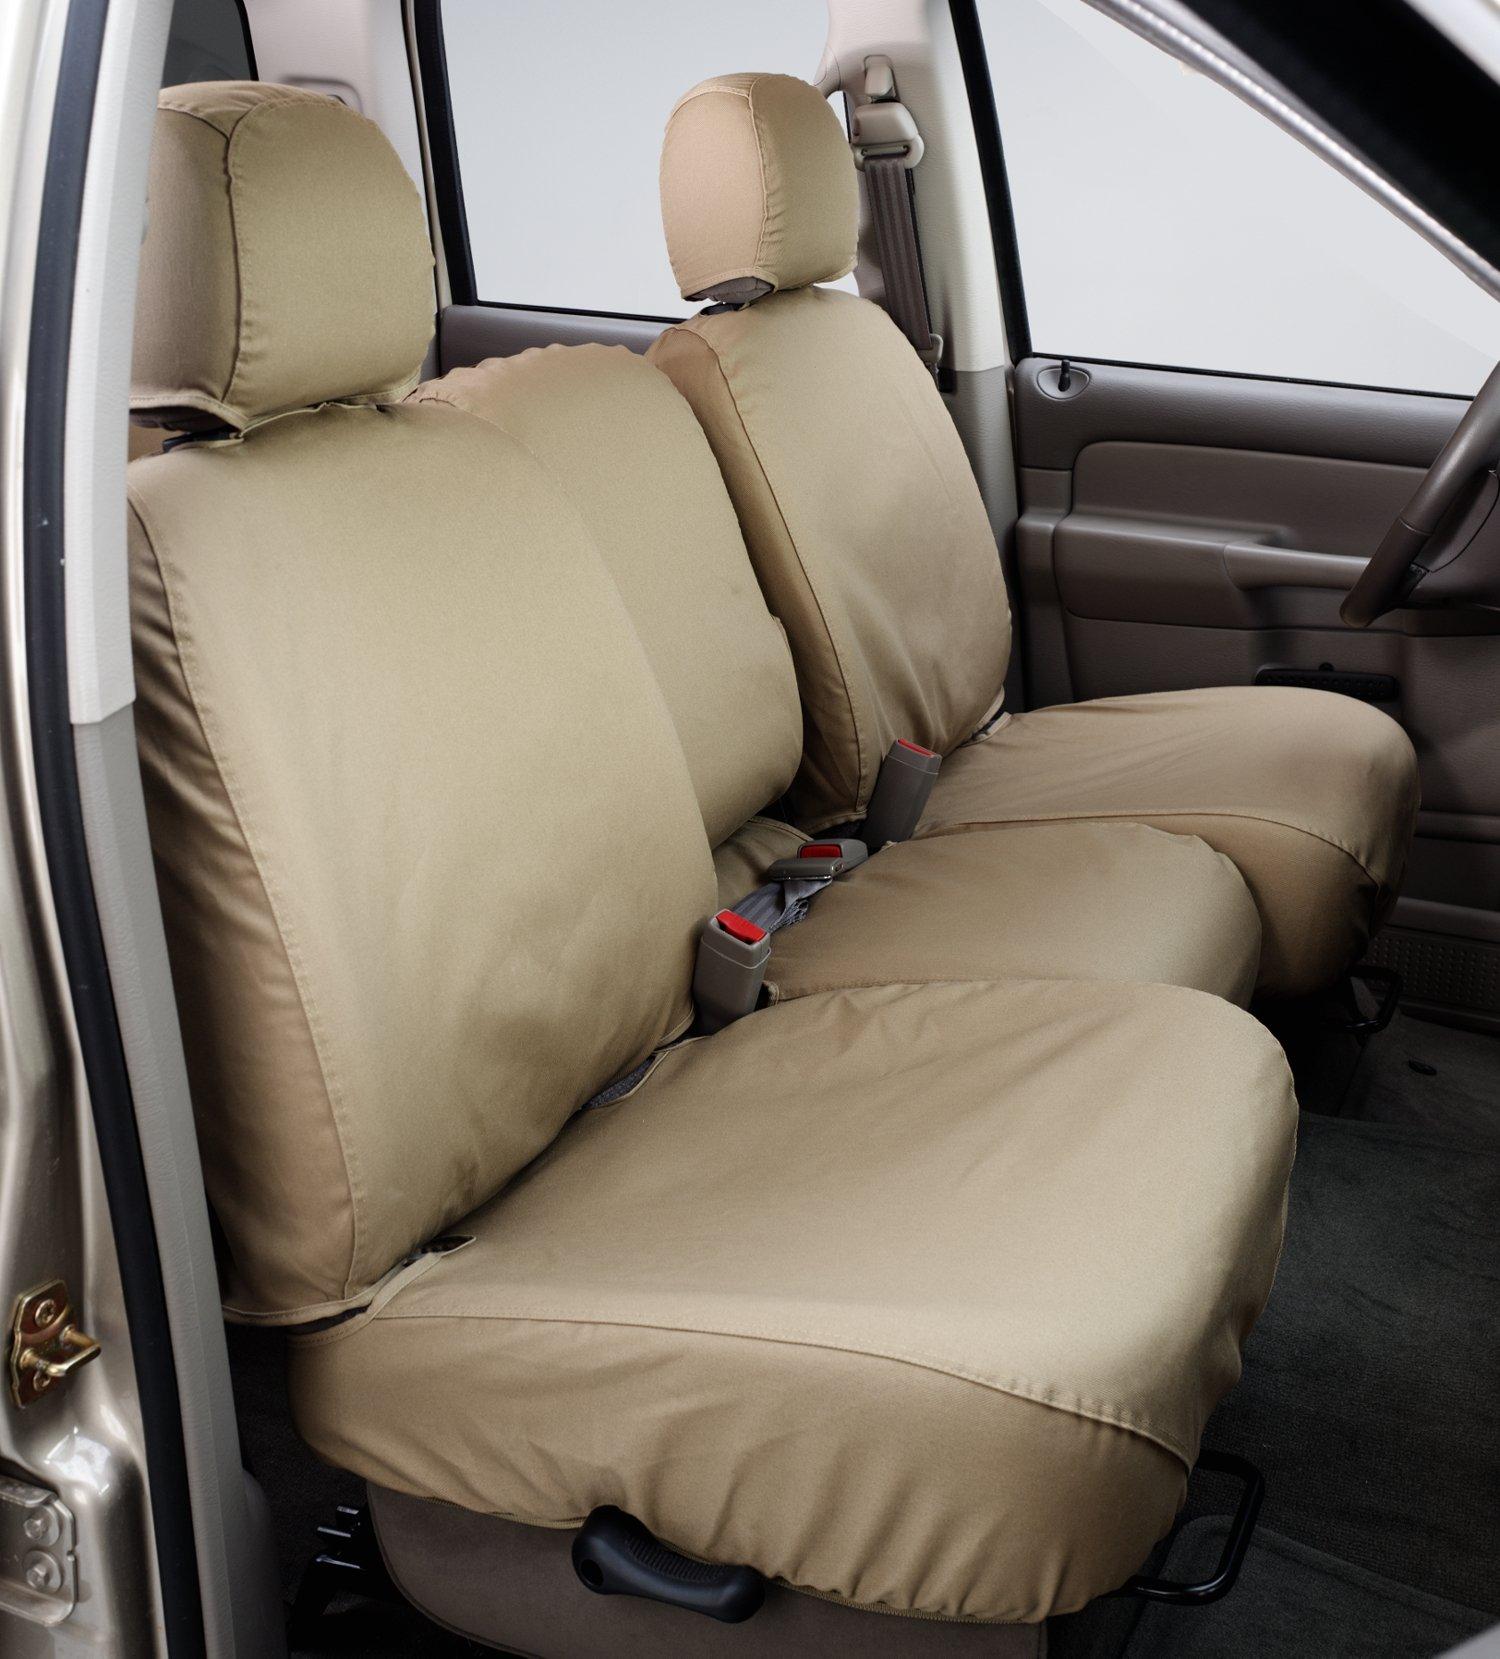 Covercraft Custom-Fit Rear-Second Seat Bench SeatSaver Seat Covers - Polycotton Fabric, Grey